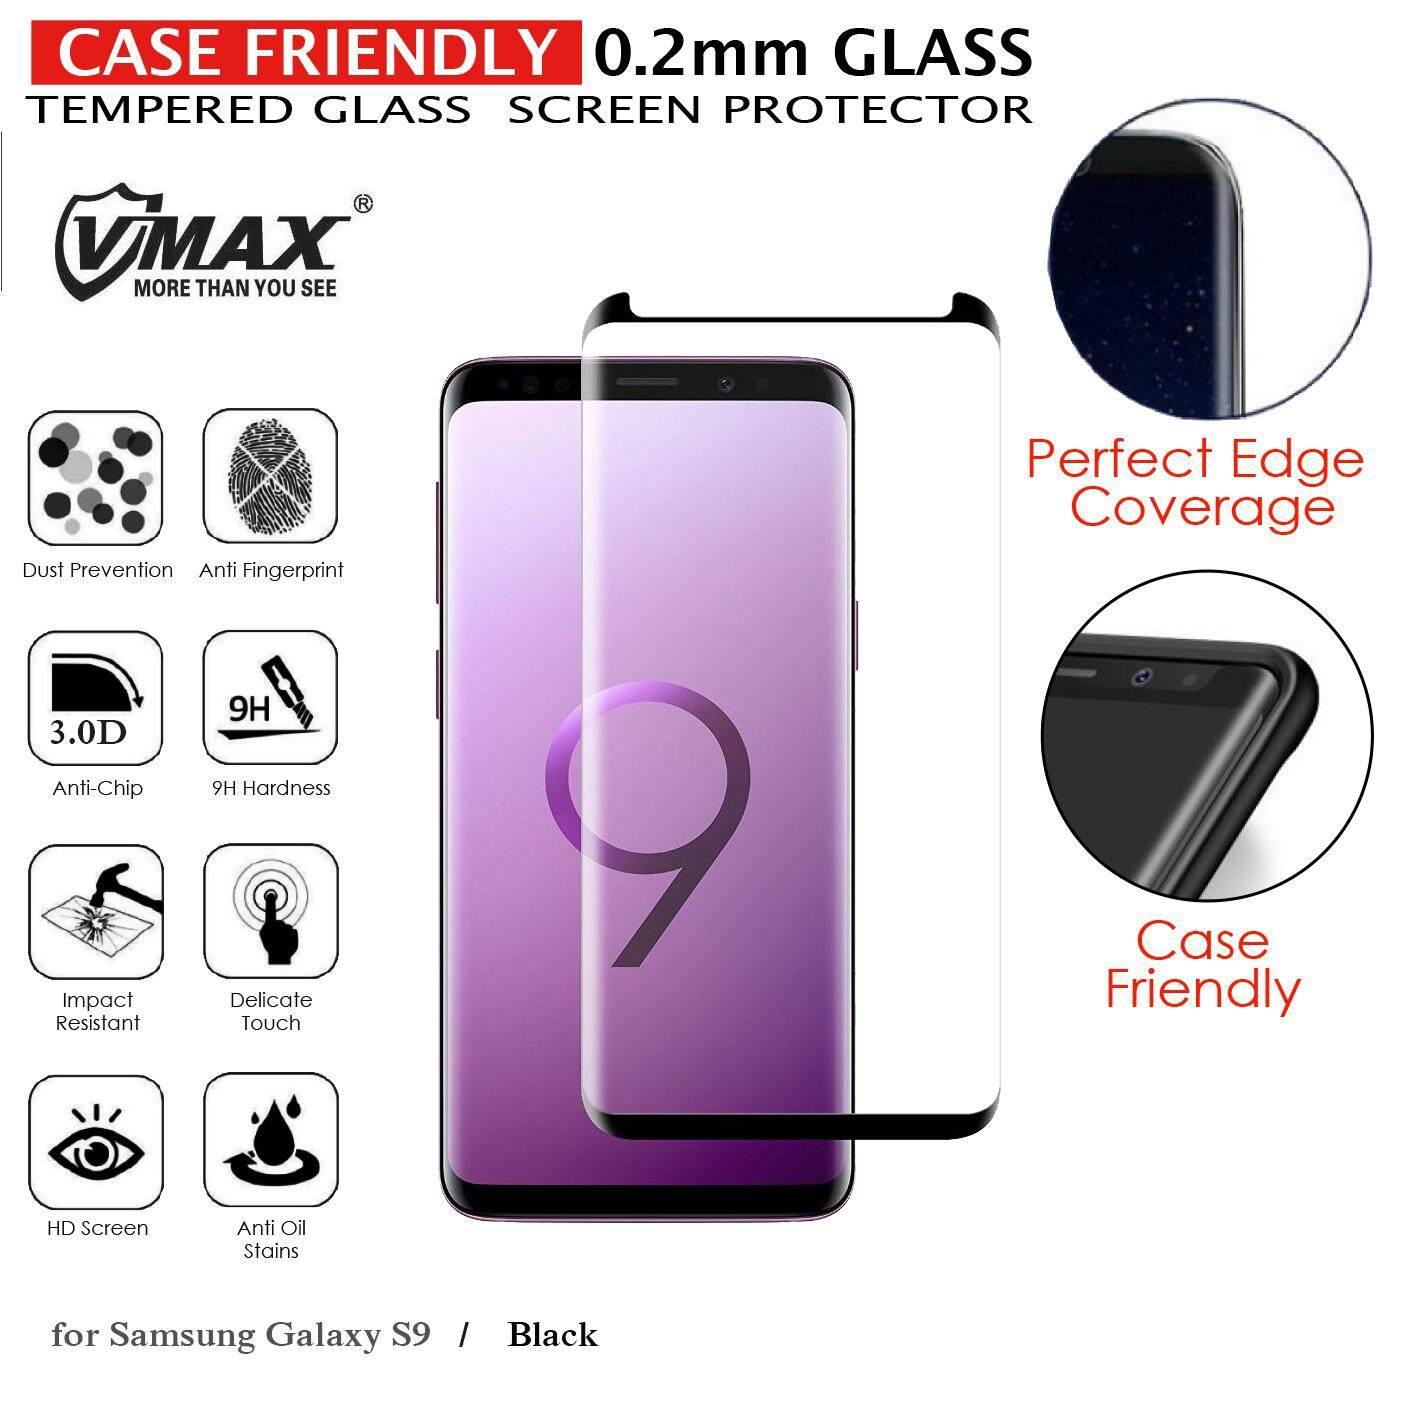 Samsung S9 Case Friendly Side Gule 1Pack